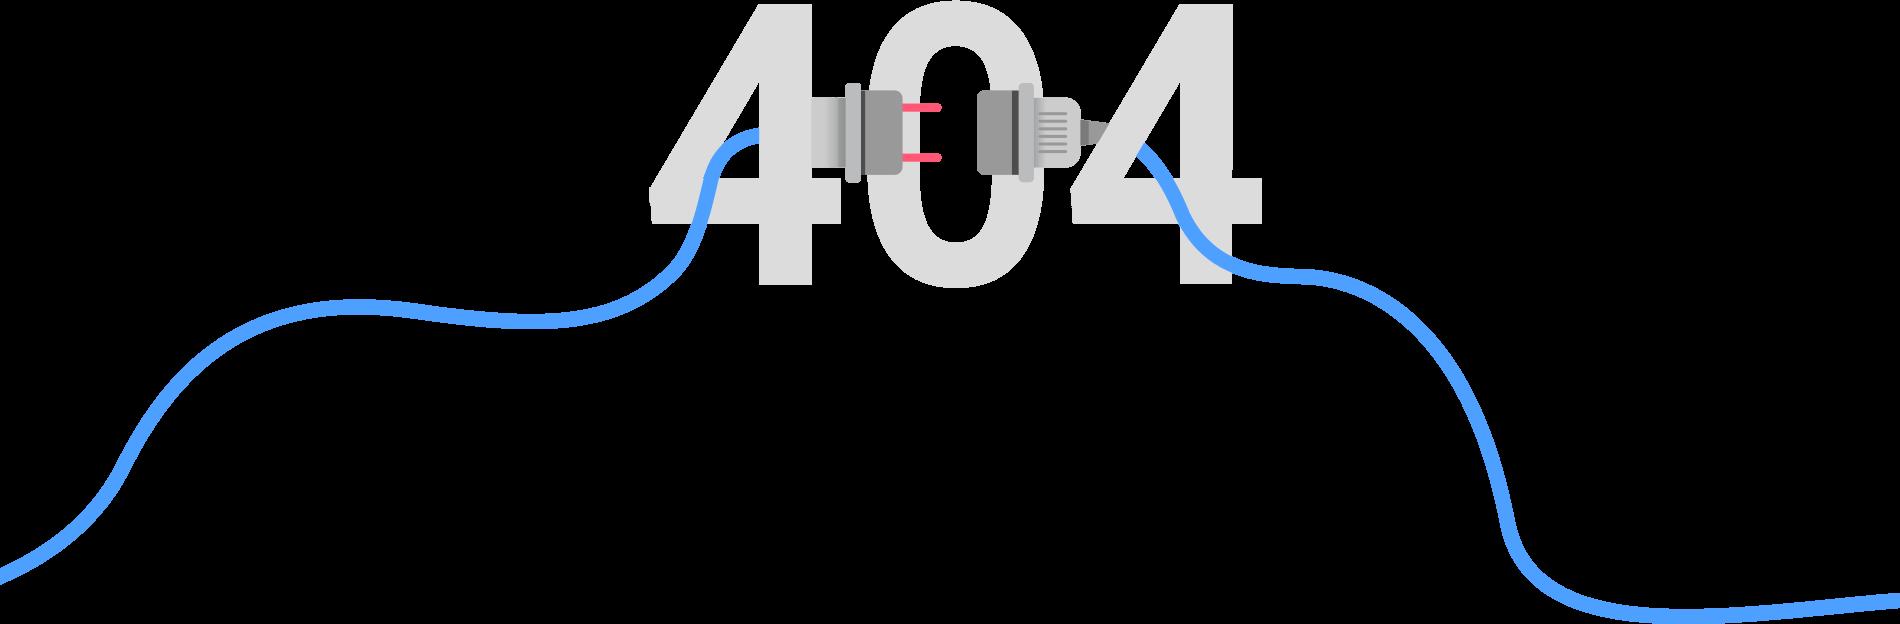 404 20 img